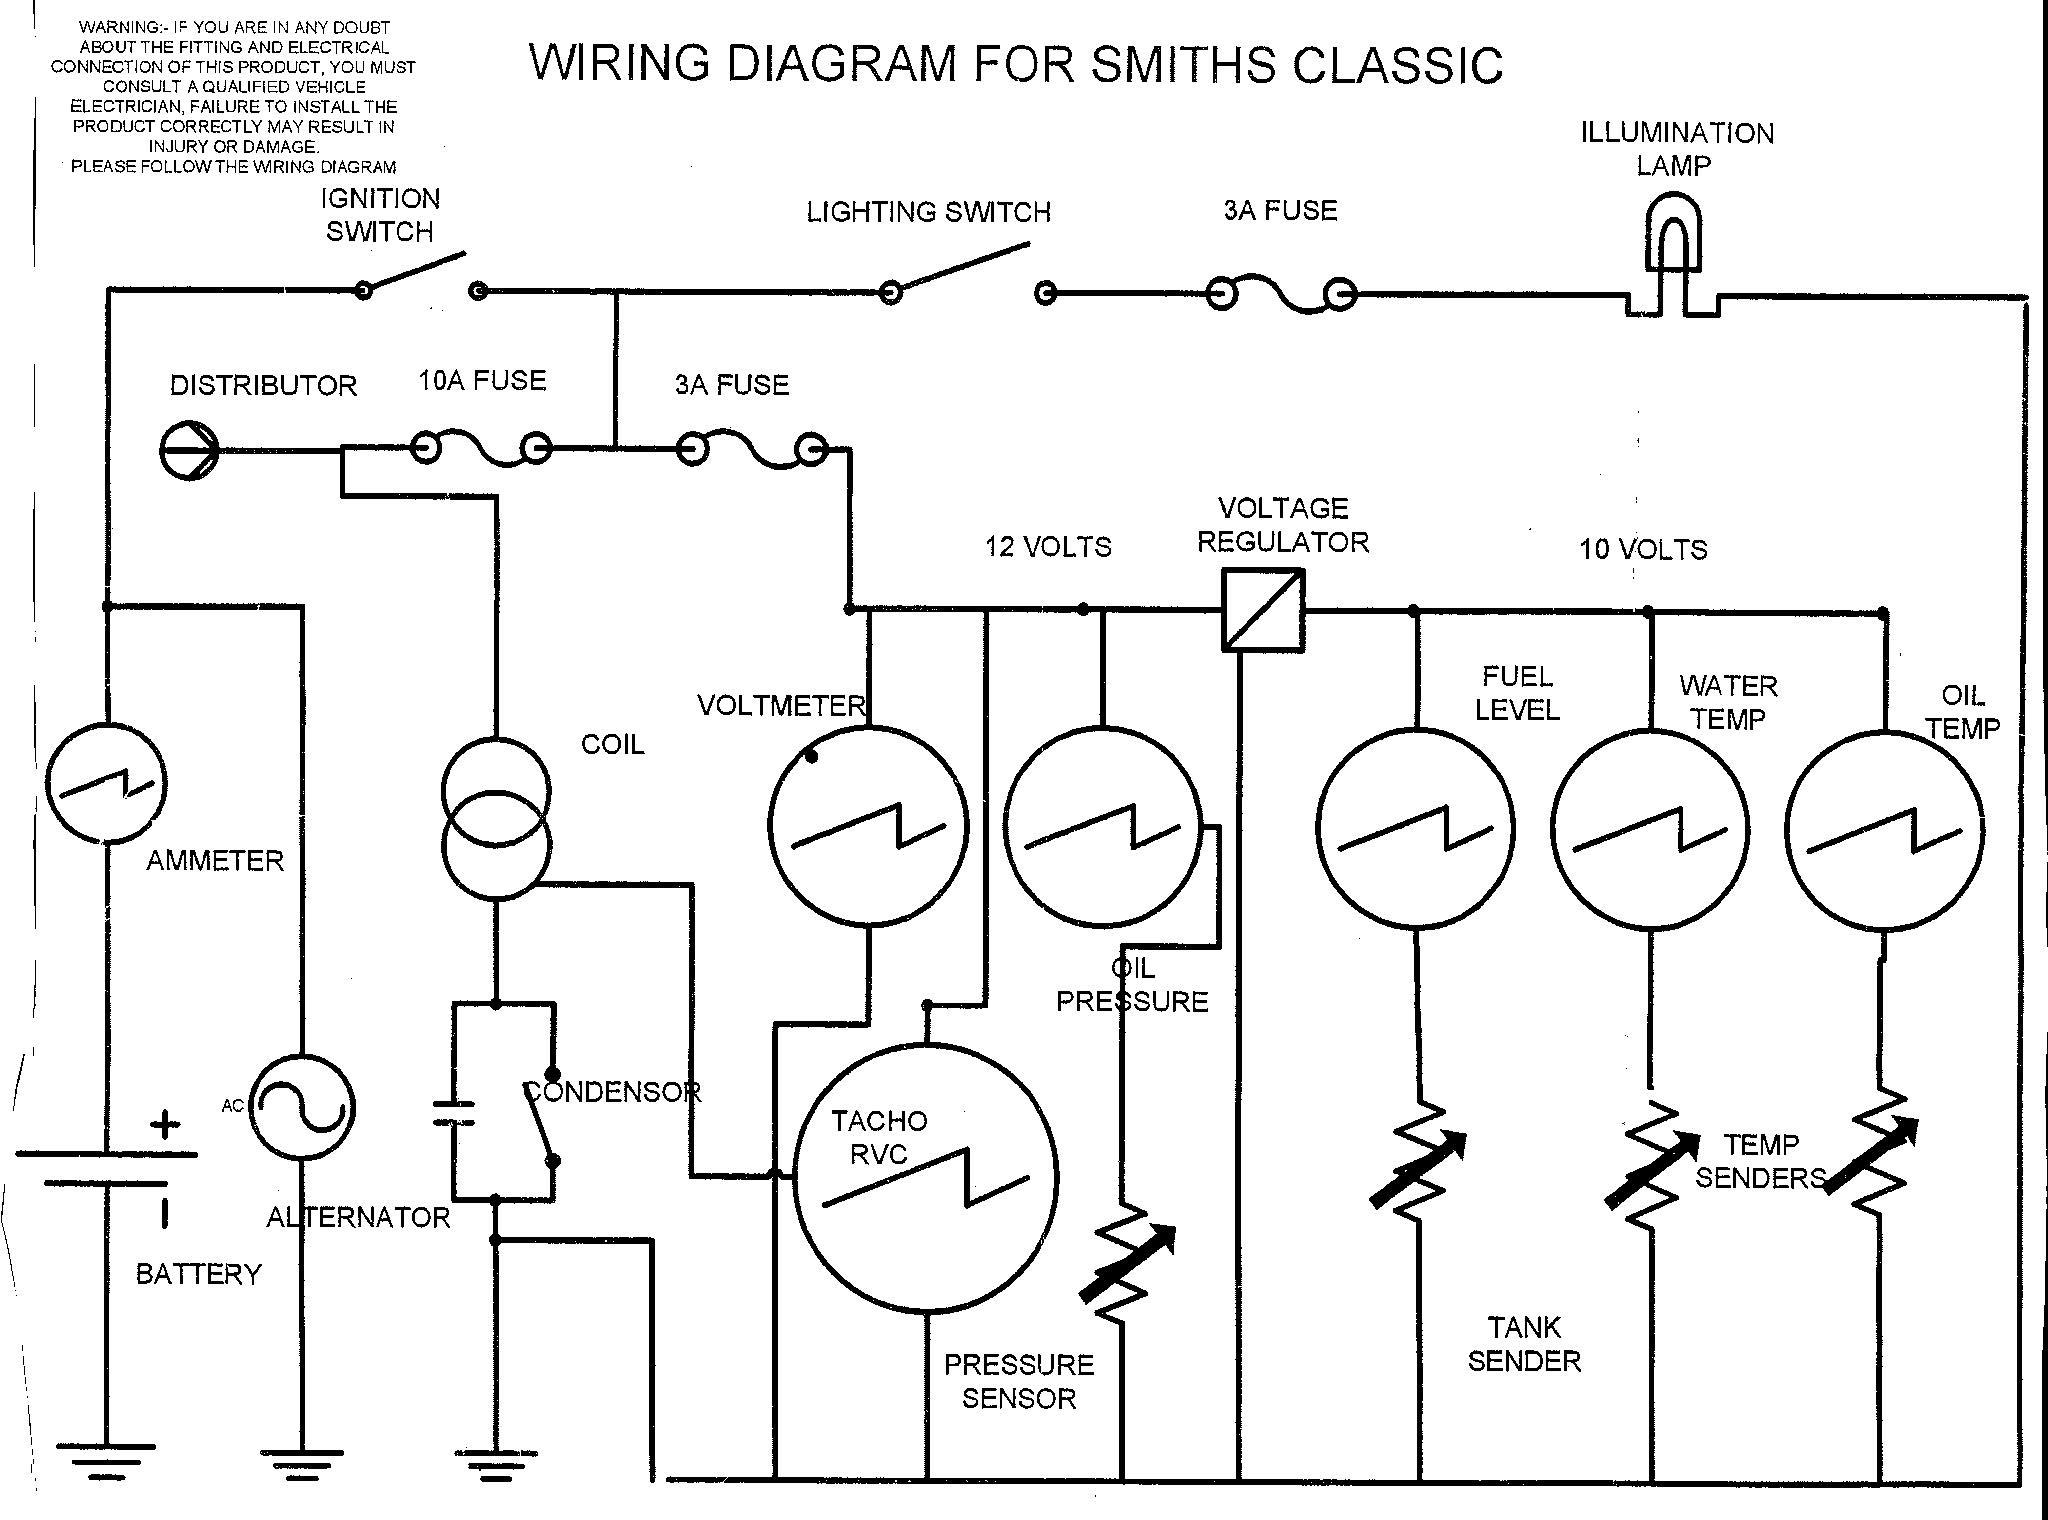 Auto Meter Speedo Wiring Diagram   Wiring Library - Universal Fuel Gauge Wiring Diagram